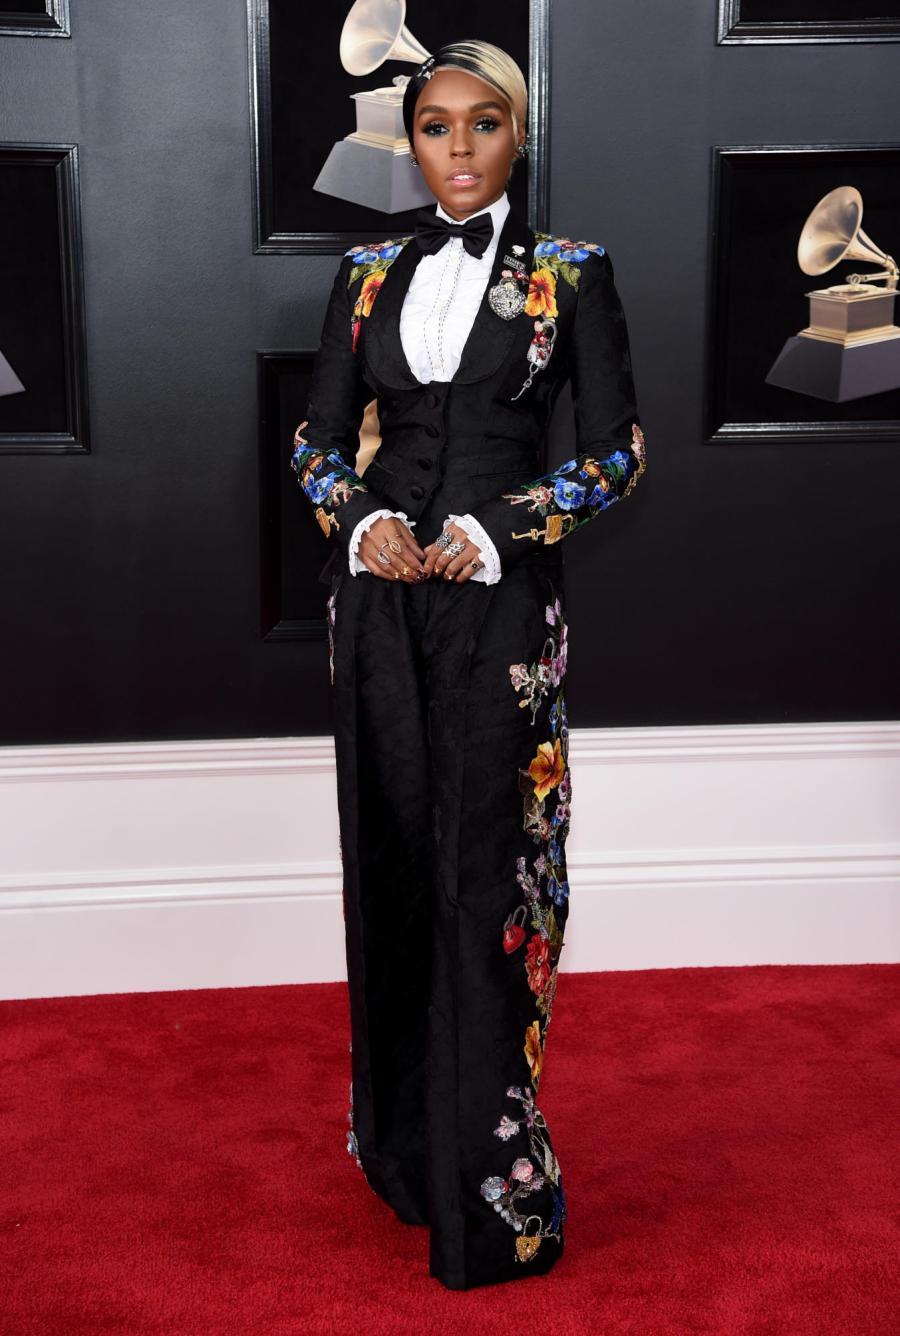 Janelle Monae in Dolce & Gabbana - Red Carpet Grammy Award 2018